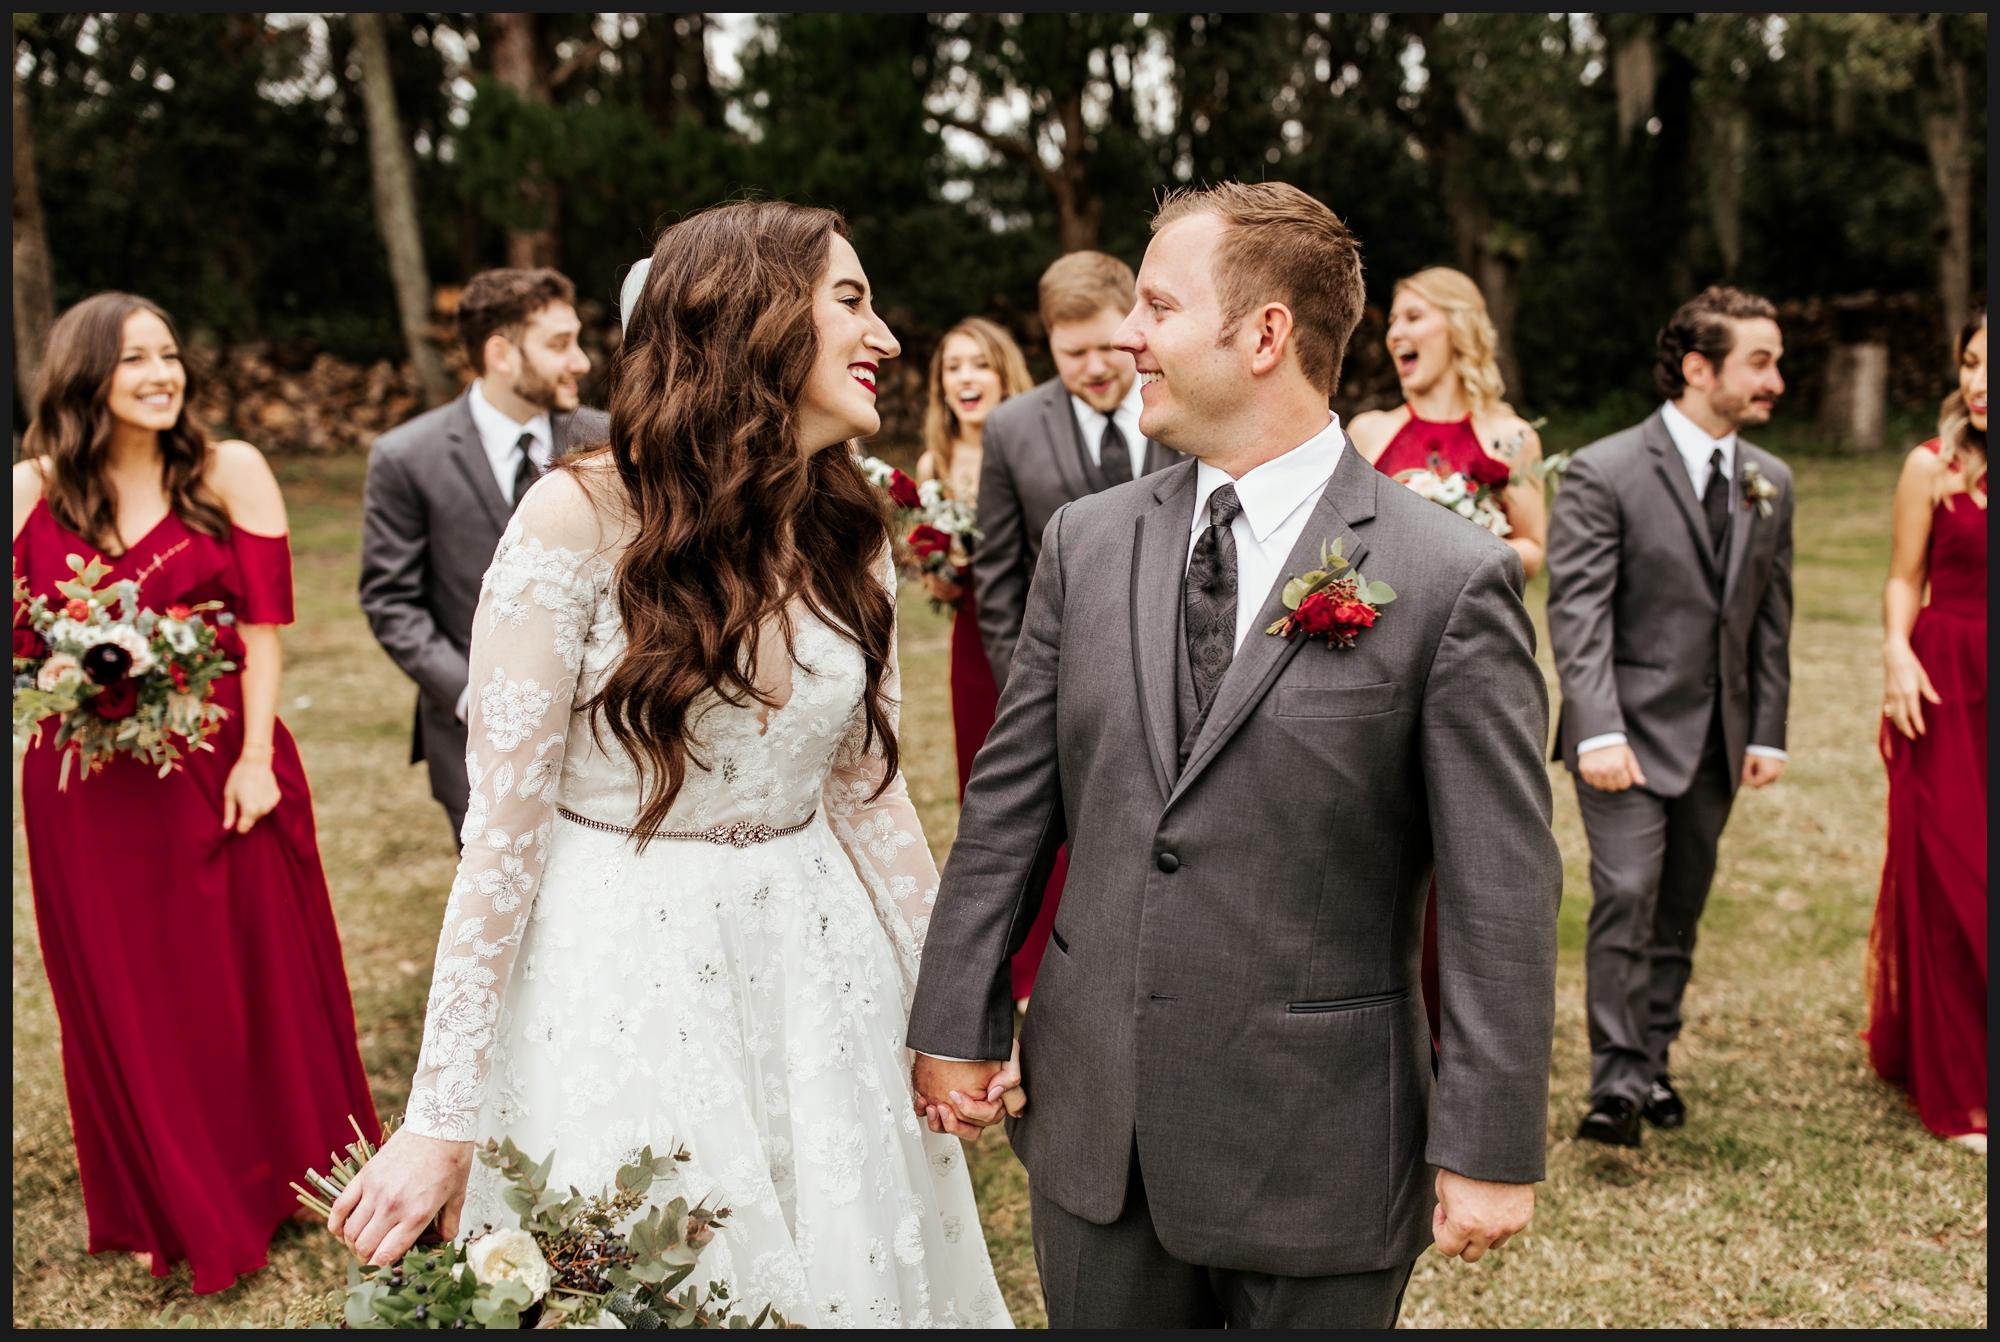 Orlando-Wedding-Photographer-destination-wedding-photographer-florida-wedding-photographer-hawaii-wedding-photographer_0515.jpg